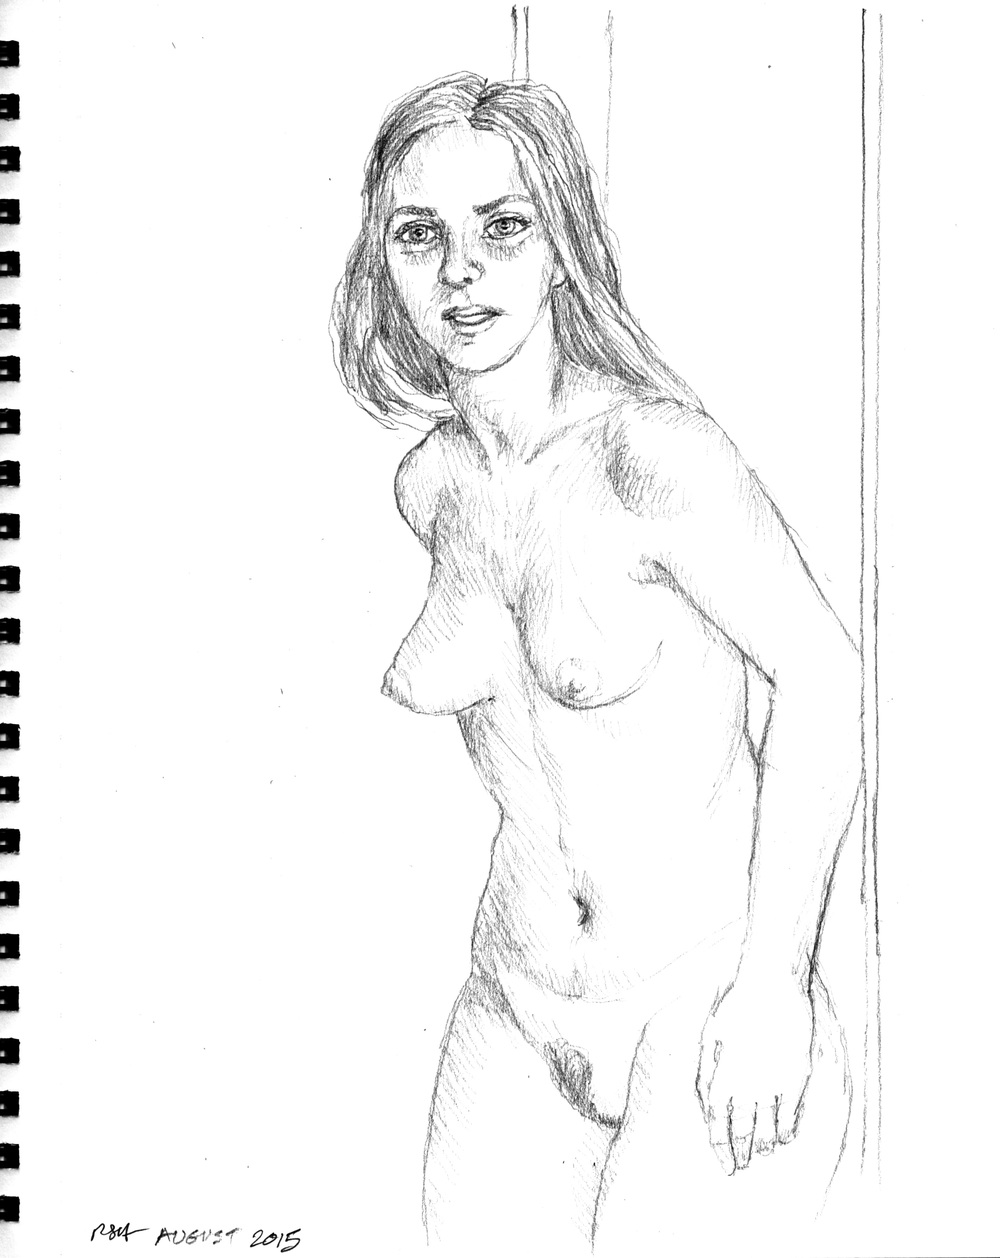 August Sept 2015 sketches_295.jpg